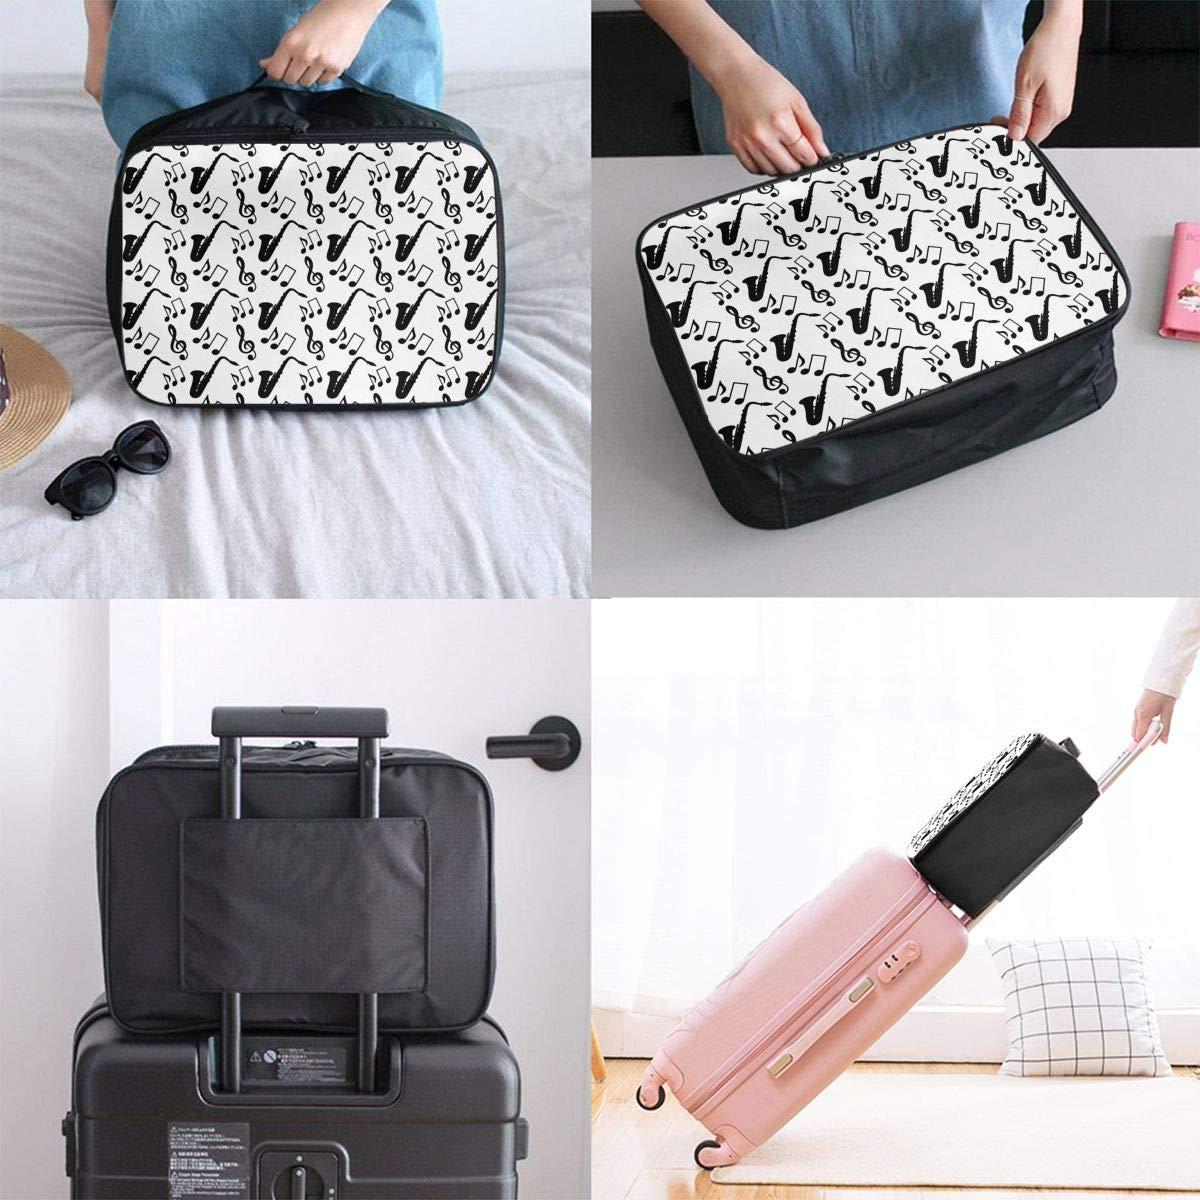 Casual Large Capacity Portable Luggage Bag Suitcase Storage Bag Luggage Packing Tote Bag Rose Floarl Travel Duffel Bag Weekend Trip